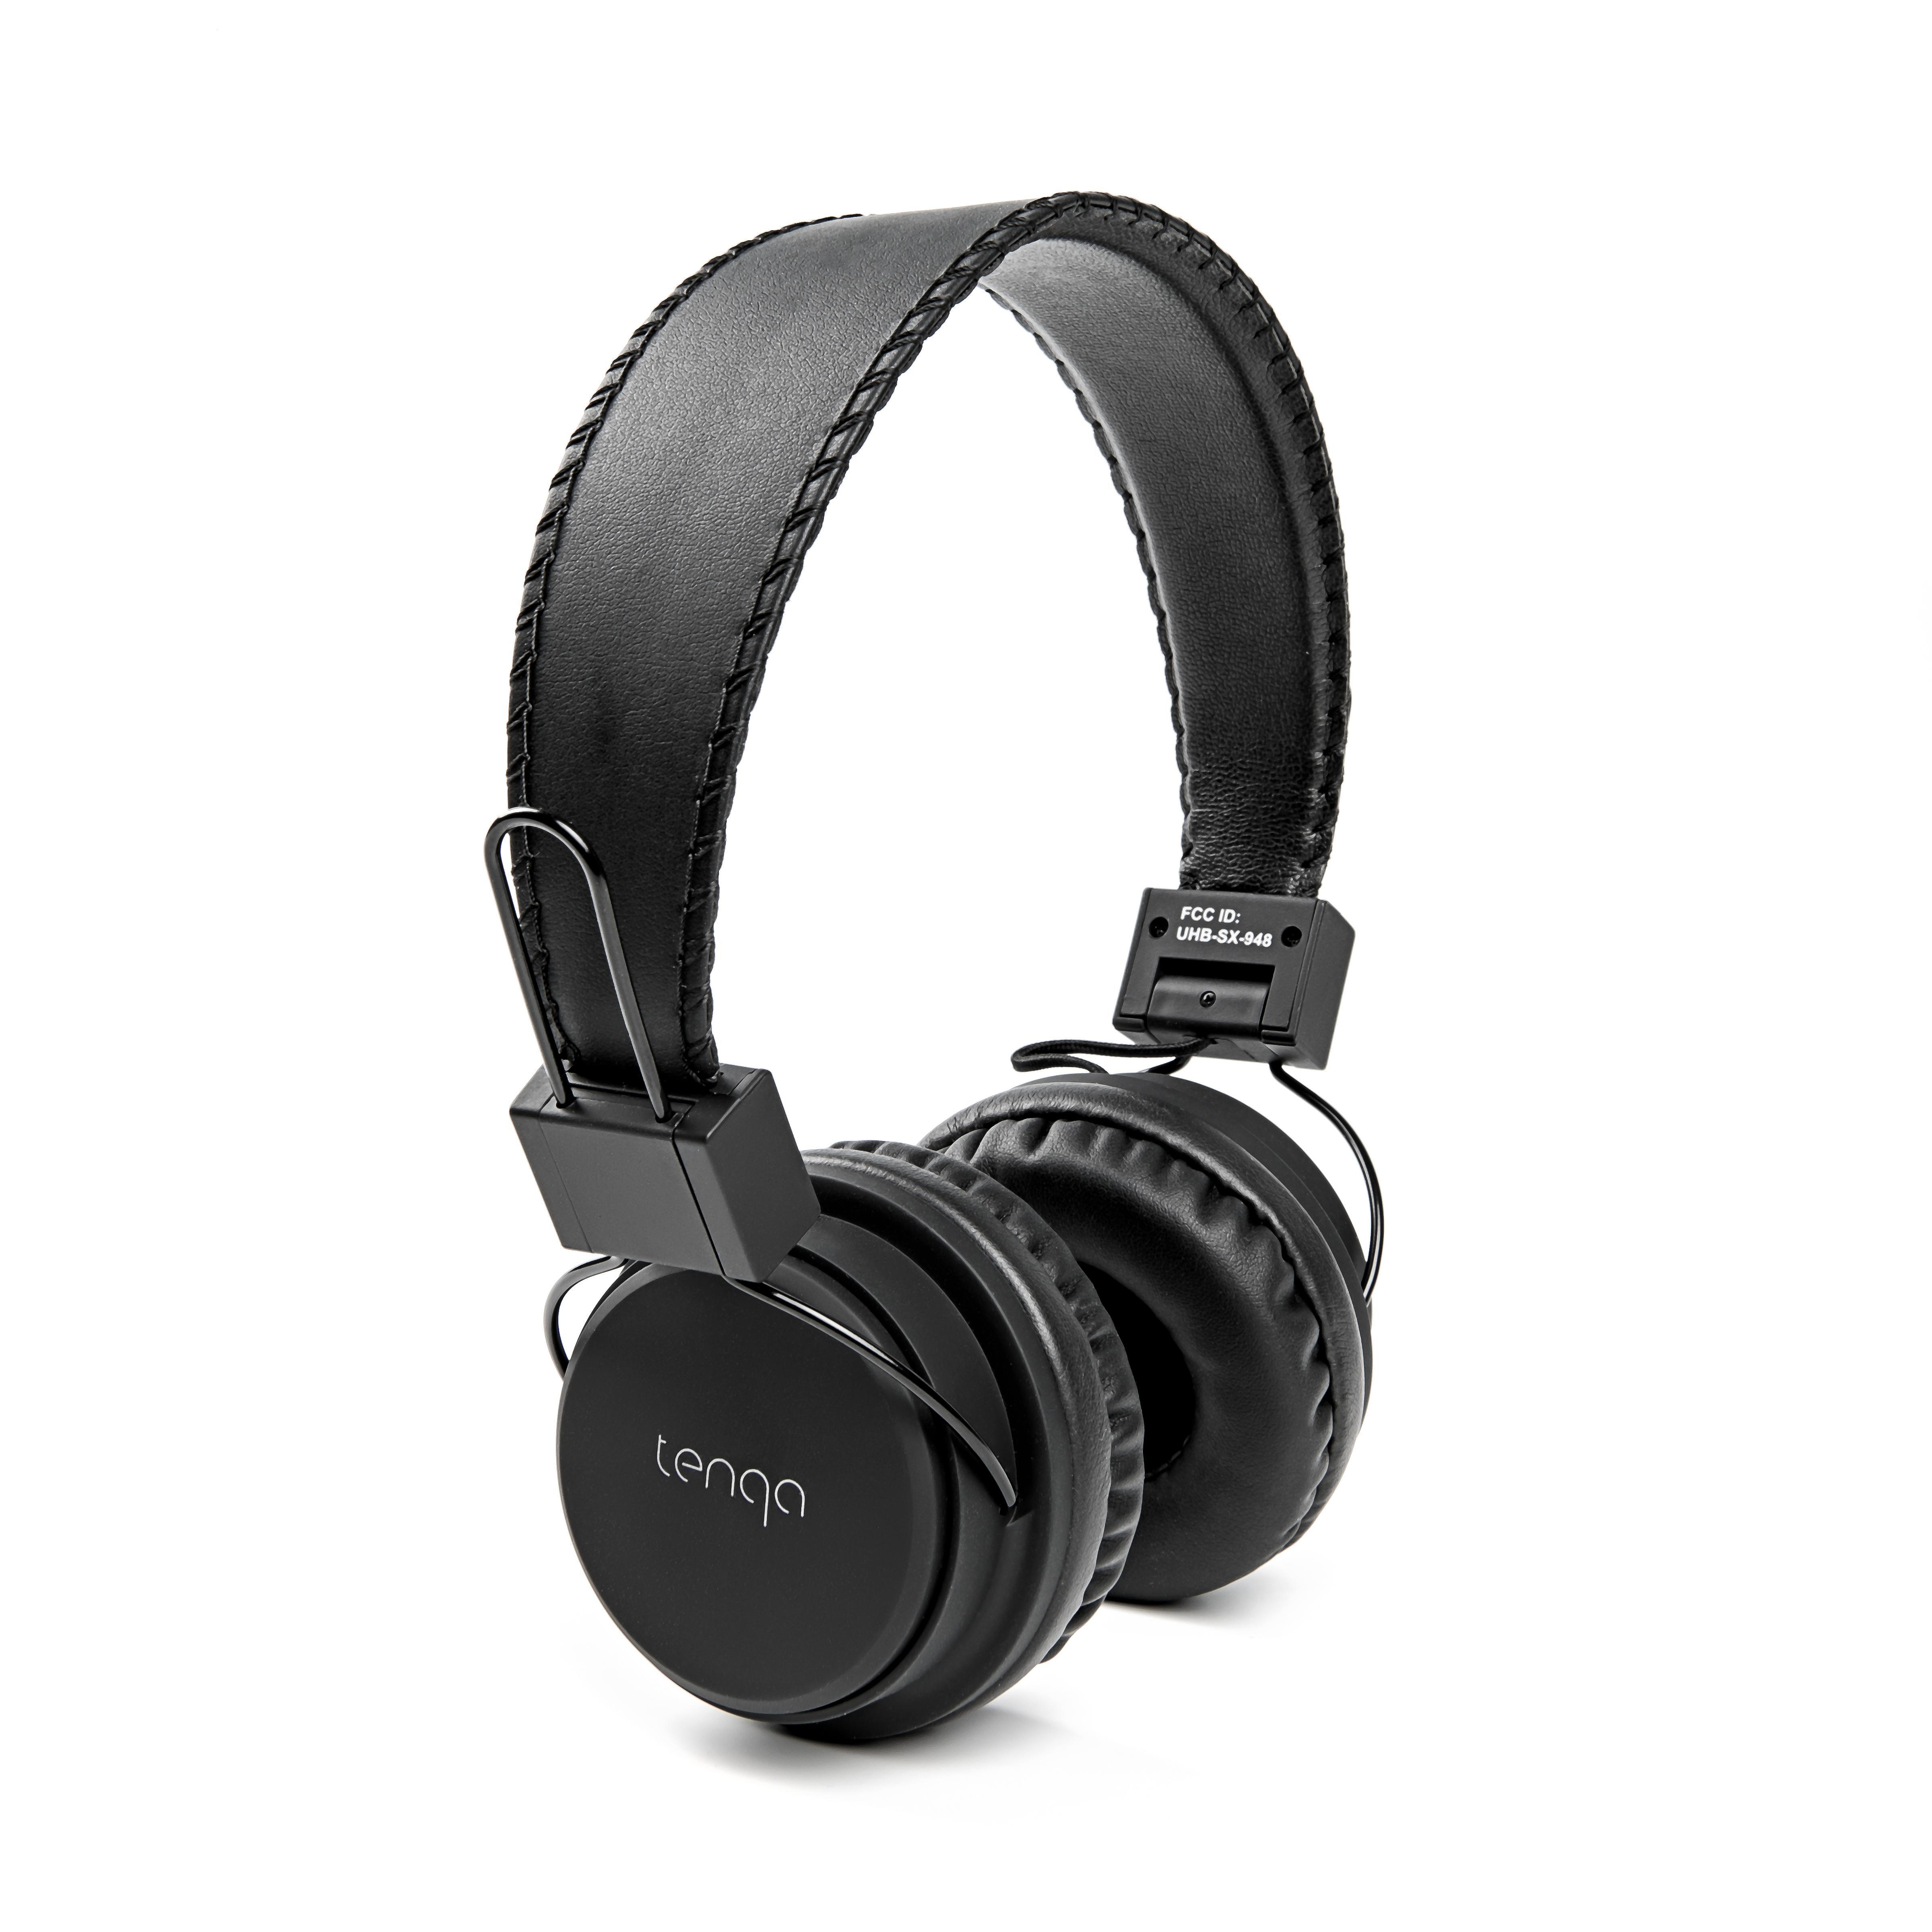 tenqa remxd wht wireless bluetooth headphones white electronics. Black Bedroom Furniture Sets. Home Design Ideas